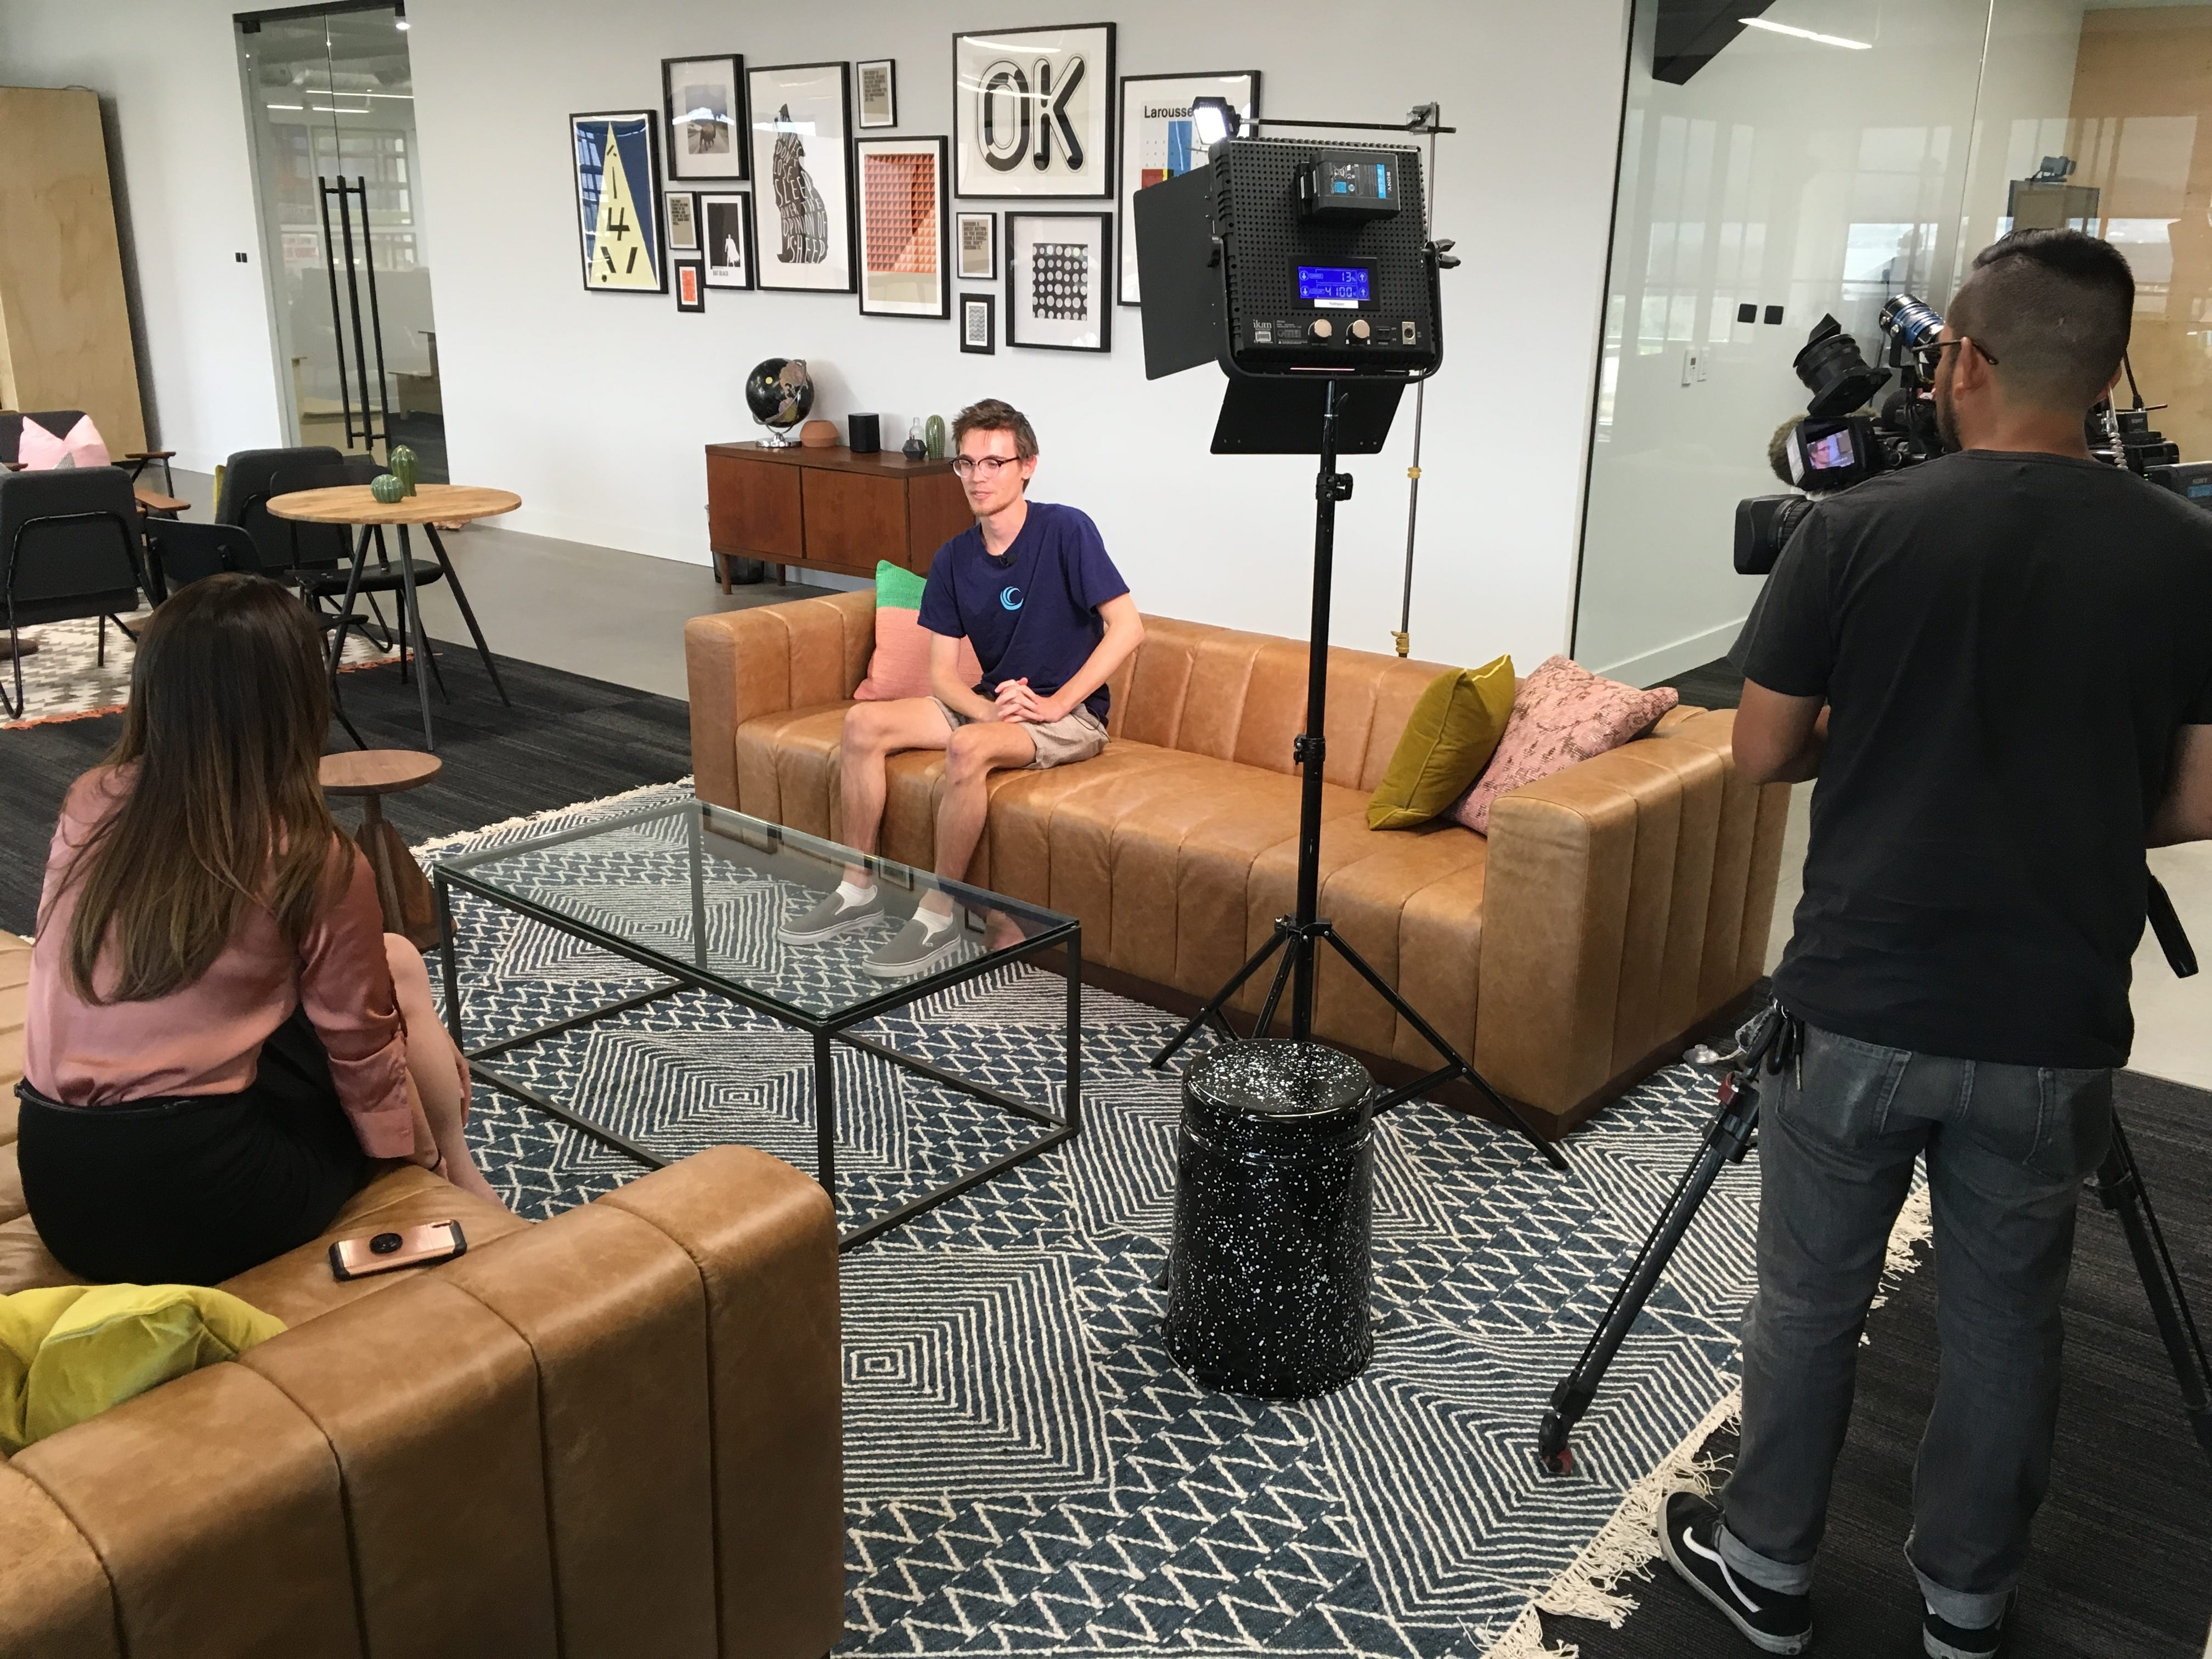 Pyramid Security founder Halston van der Sluys being interviewed by a local news station